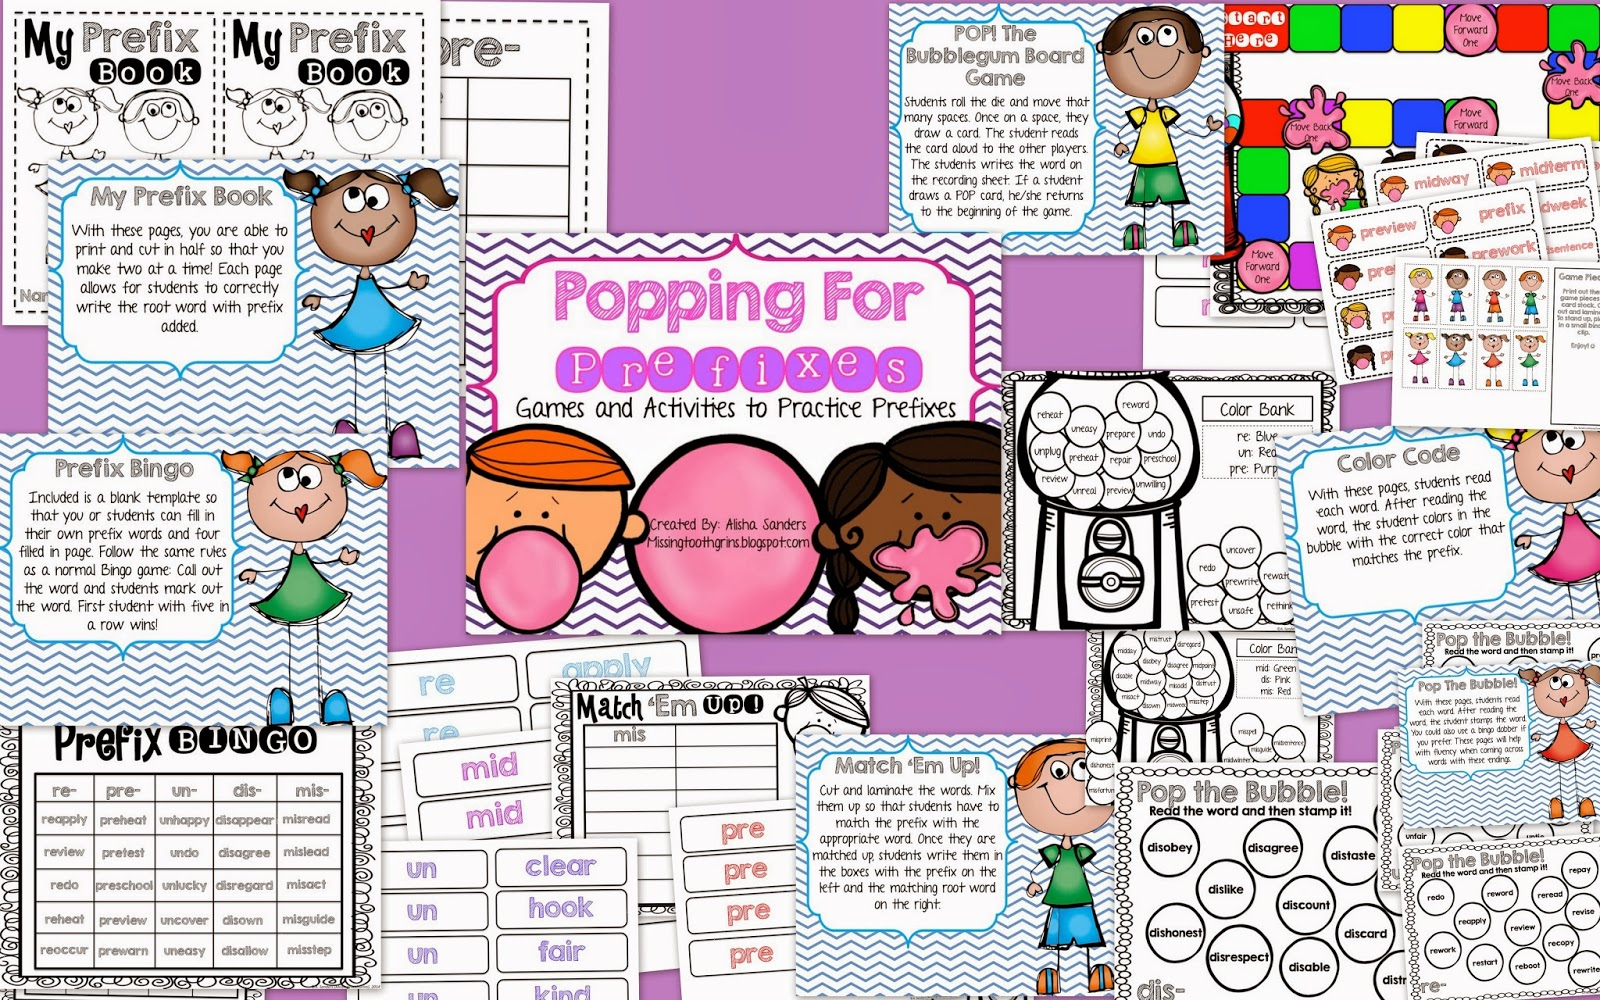 http://www.teacherspayteachers.com/Product/Popping-For-Prefixes-Games-Activities-for-Practicing-Prefixes-1137679